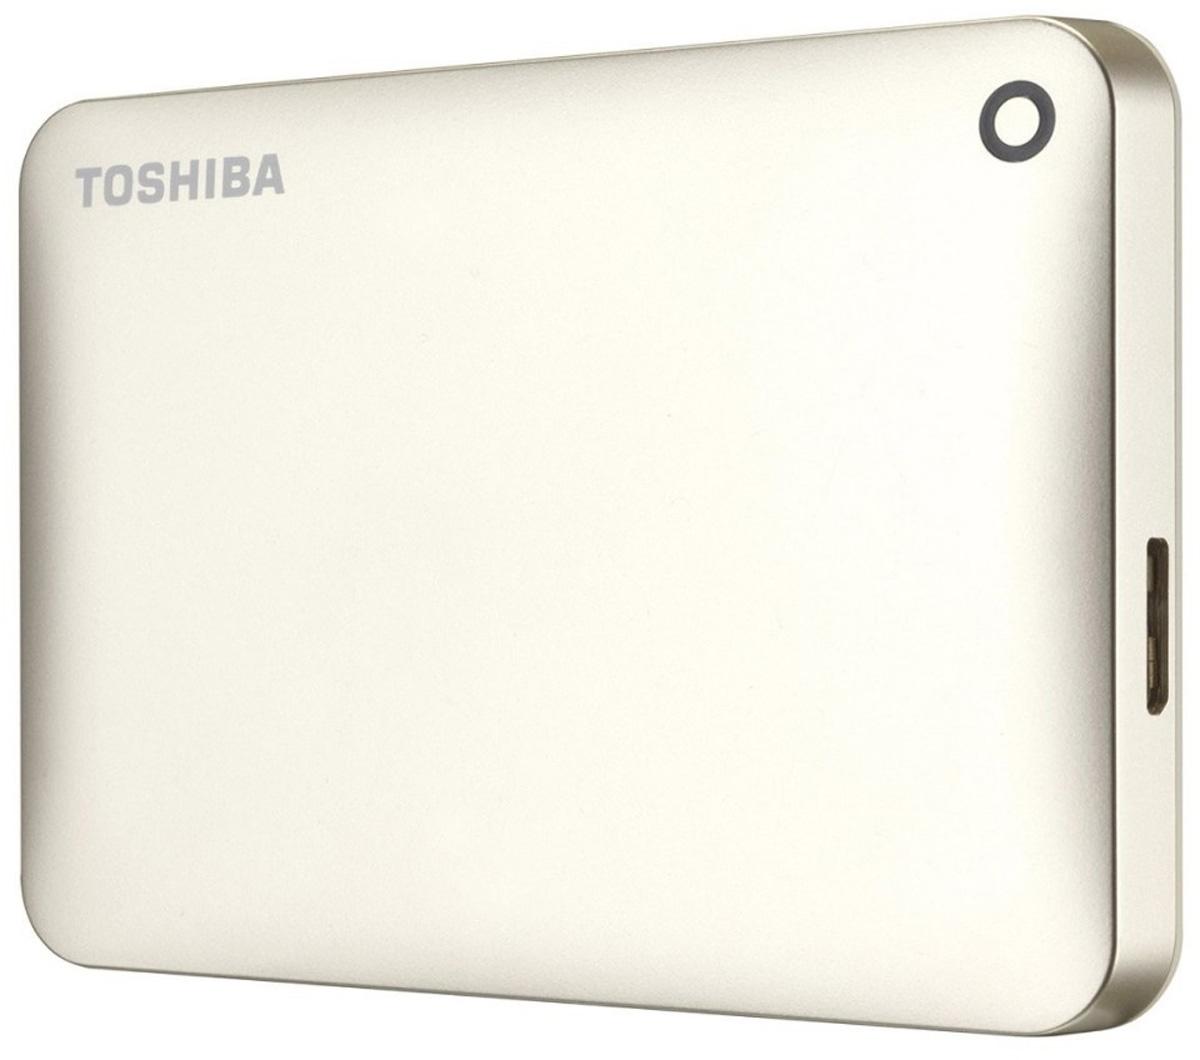 Toshiba Canvio Connect II 500GB, Gold внешний жесткий диск (HDTC805EC3AA) - Носители информации